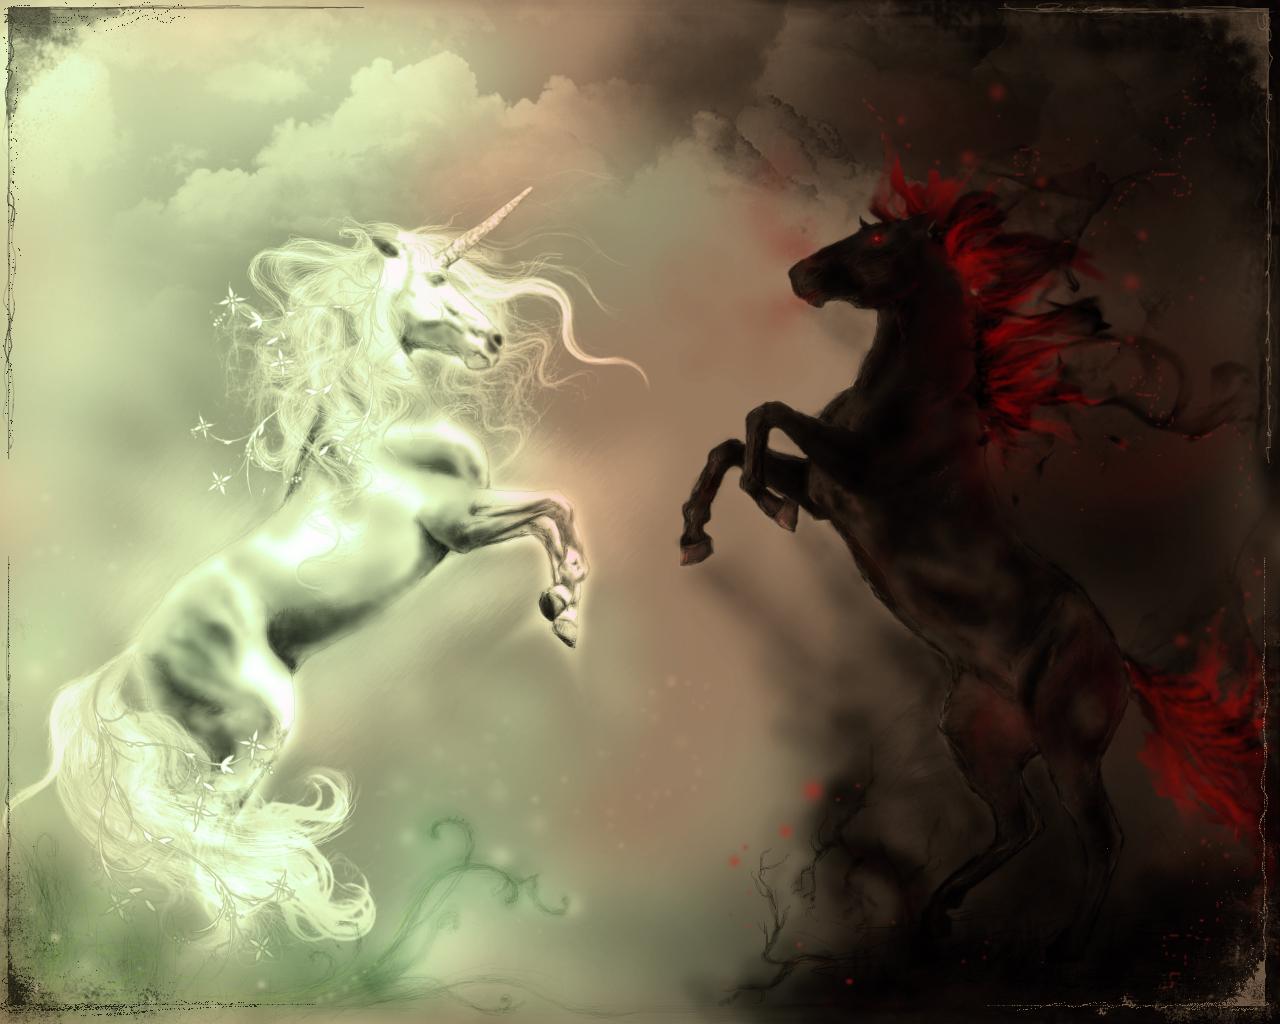 unicorn vs. nightmare